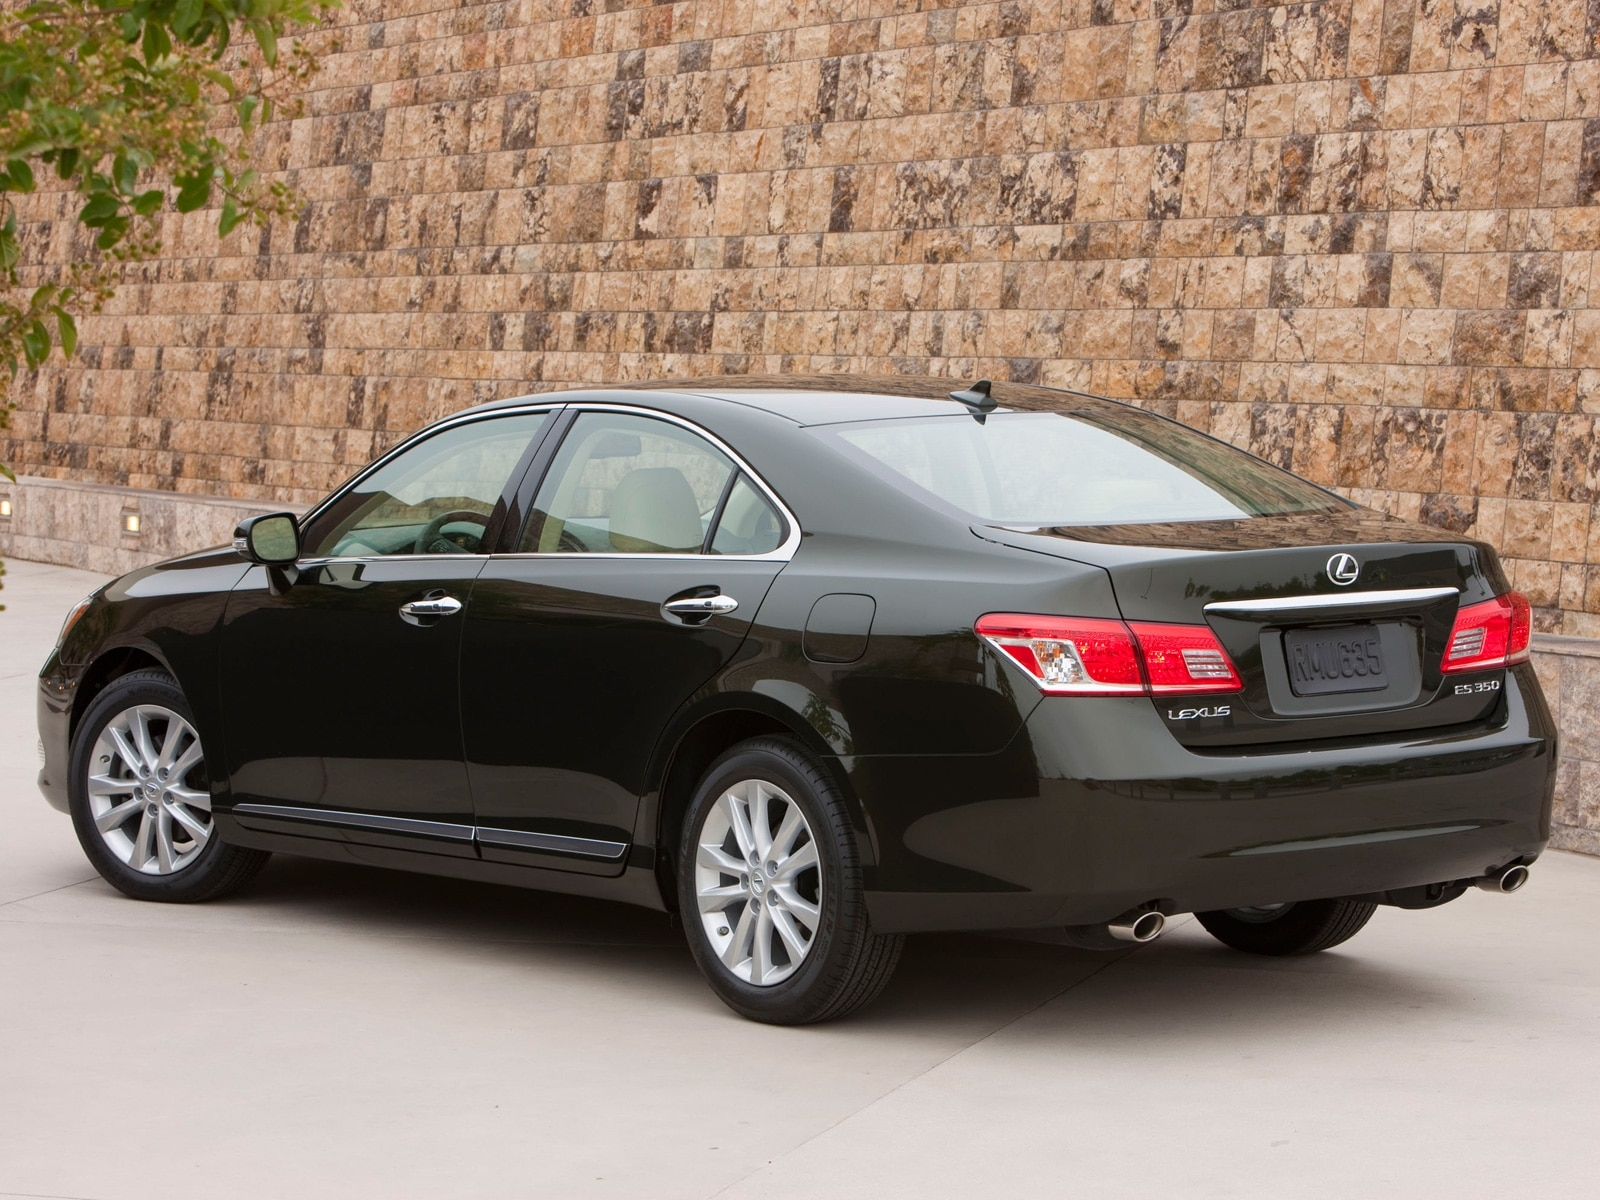 2010 Lexus Es350 Lexus Luxury Sedan Review Automobile Magazine